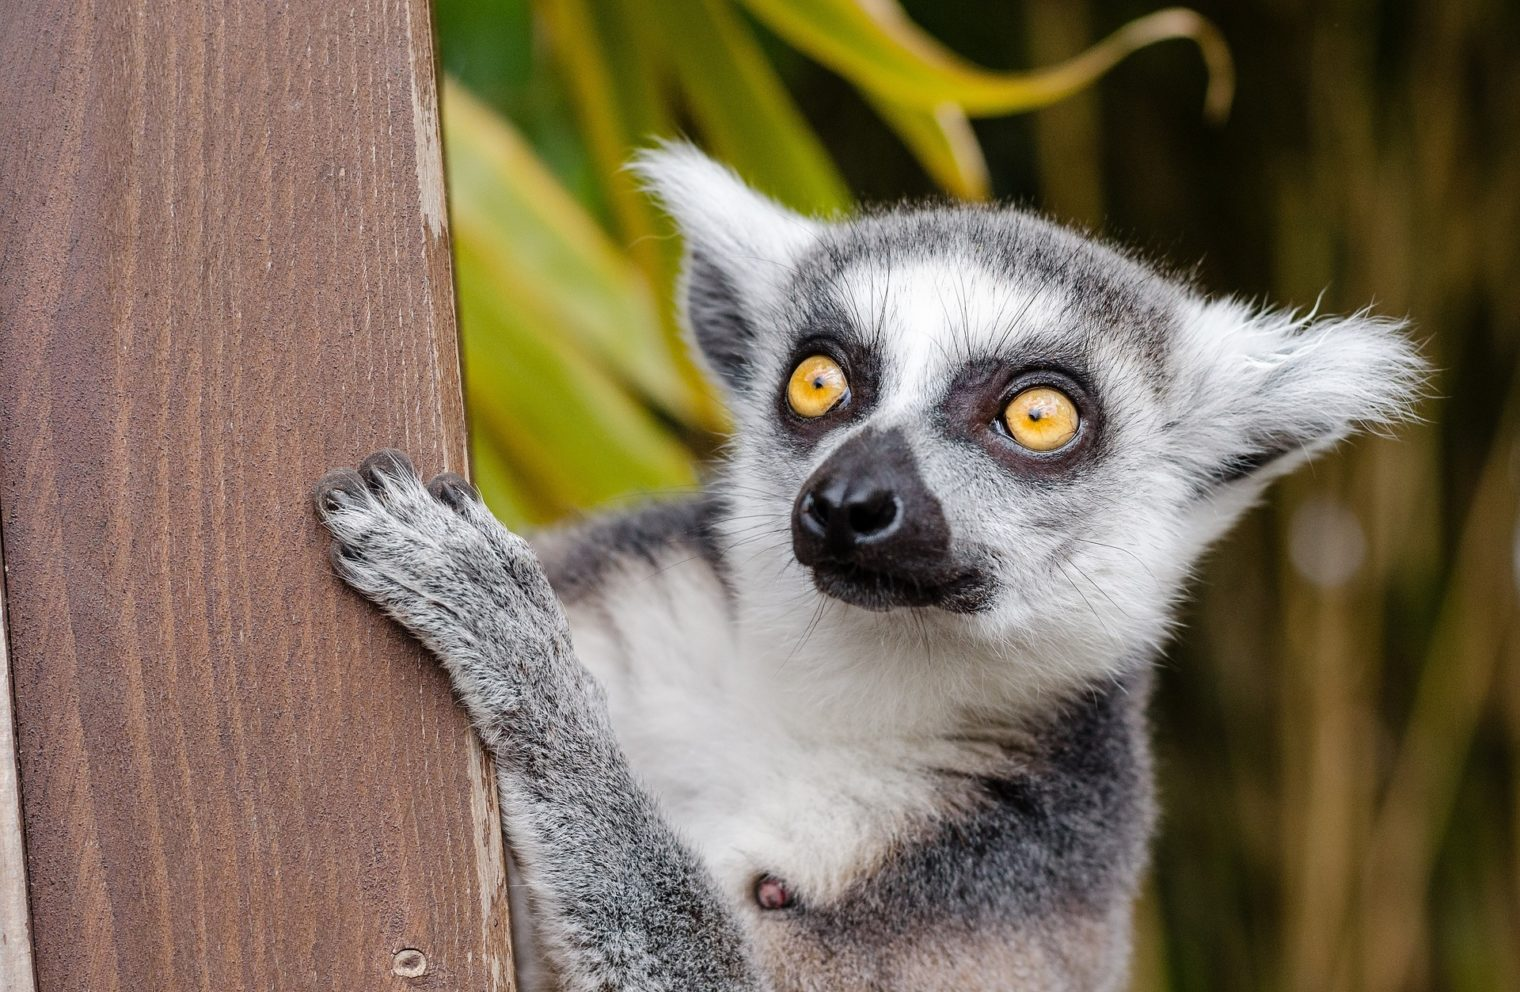 lemur-ring-tailed-lemur-primate